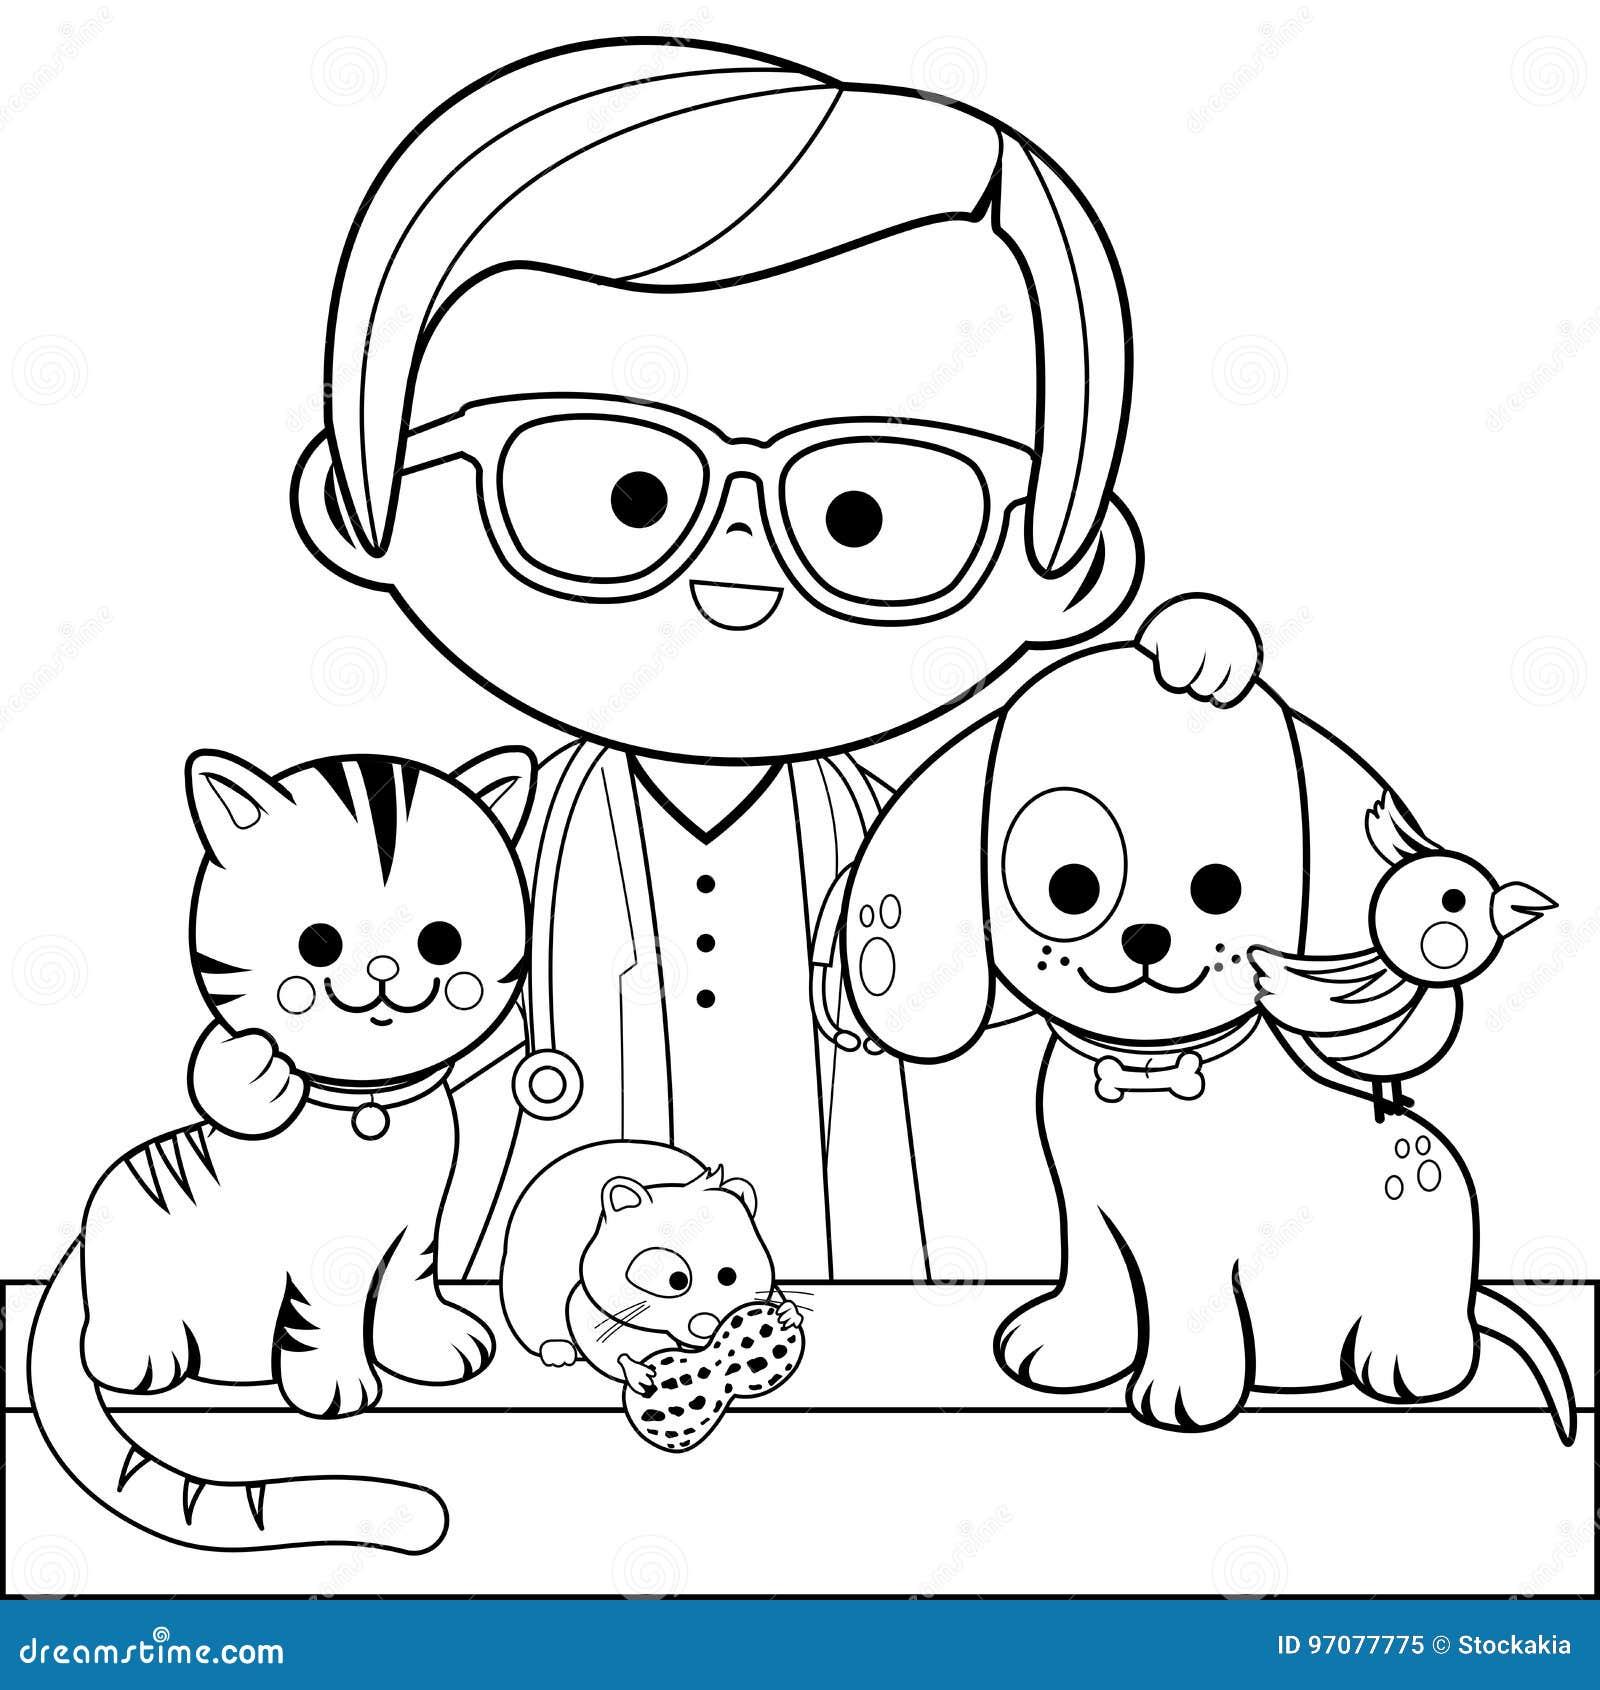 Veterinario E Animais De Estimacao Pagina Do Livro Para Colorir